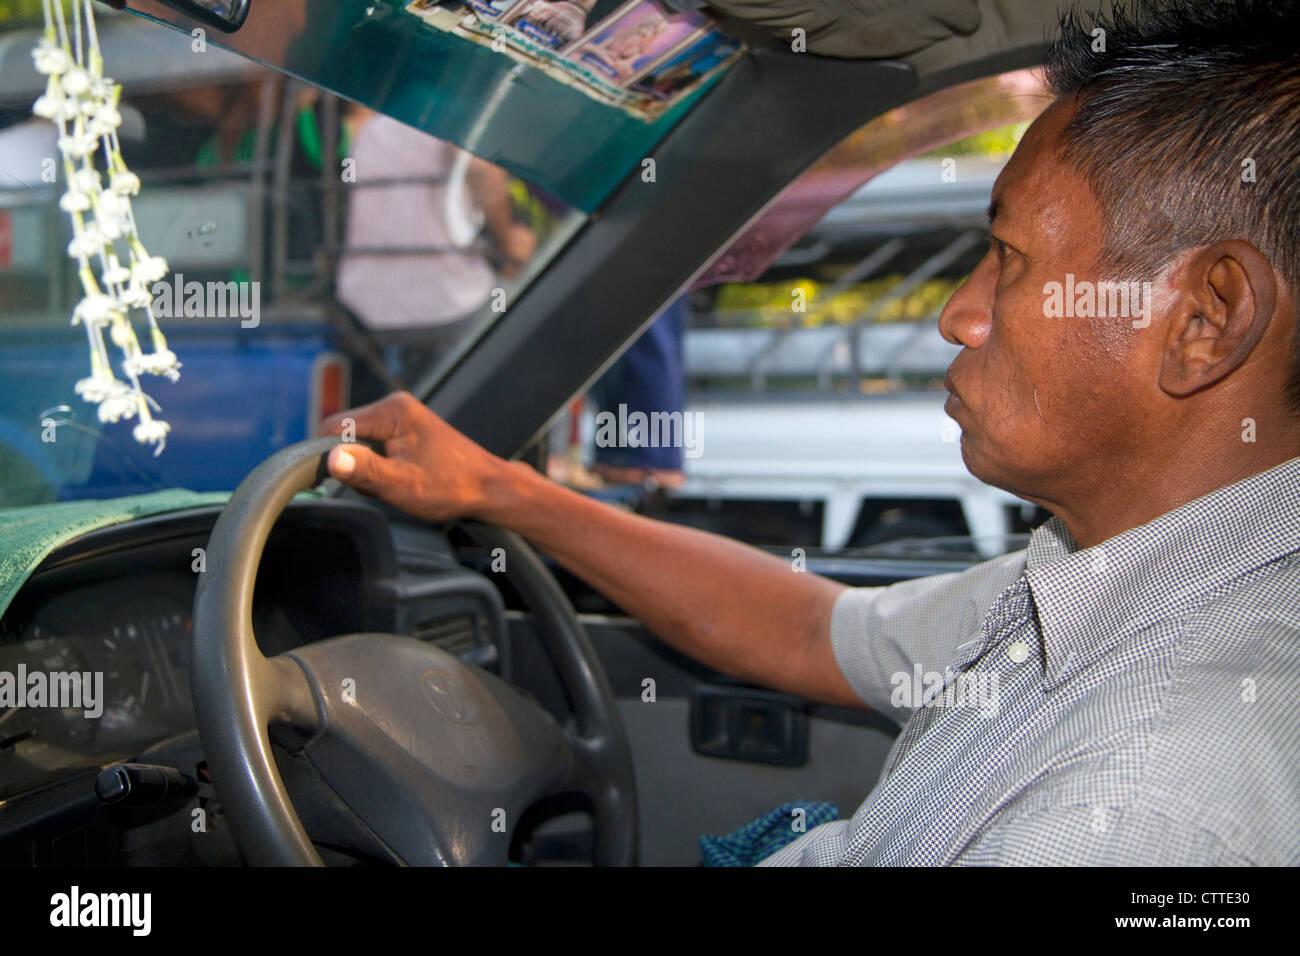 Burmese taxi driver in (Rangoon) Yangon, (Burma) Myanmar. - Stock Image